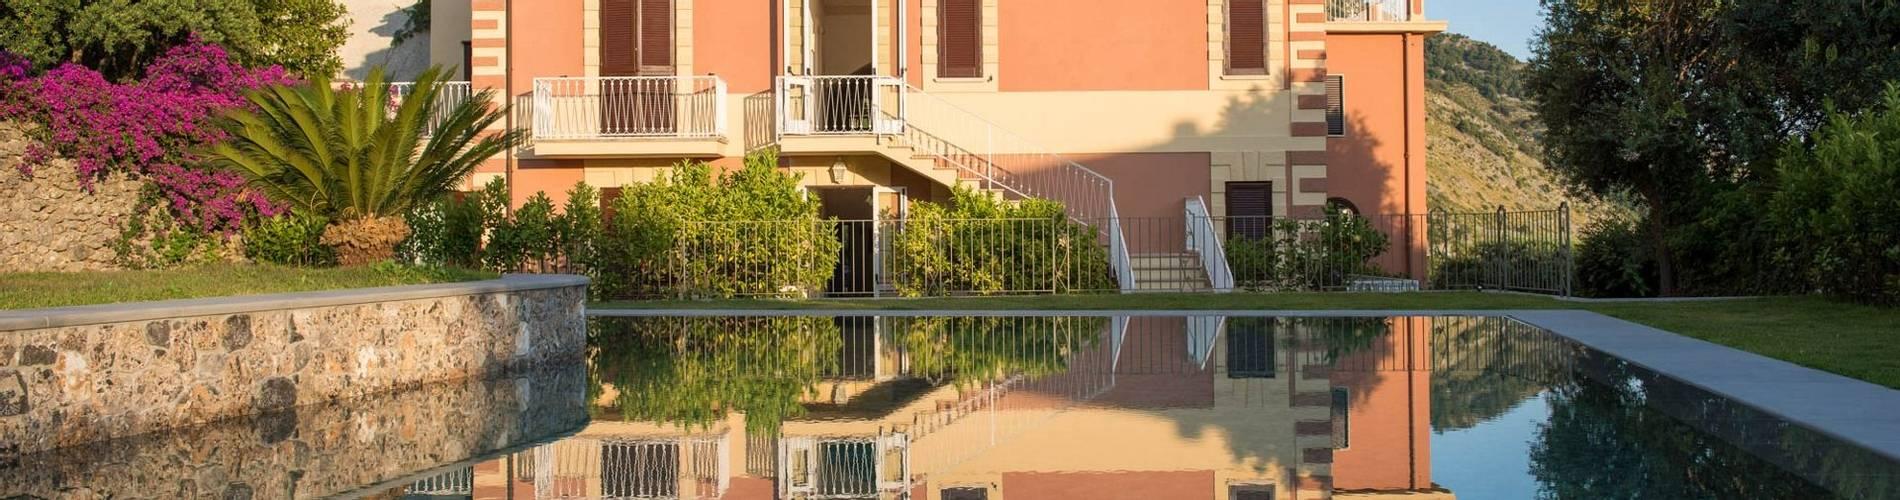 Villa Cheta, Basilicata, Italy (6).jpg